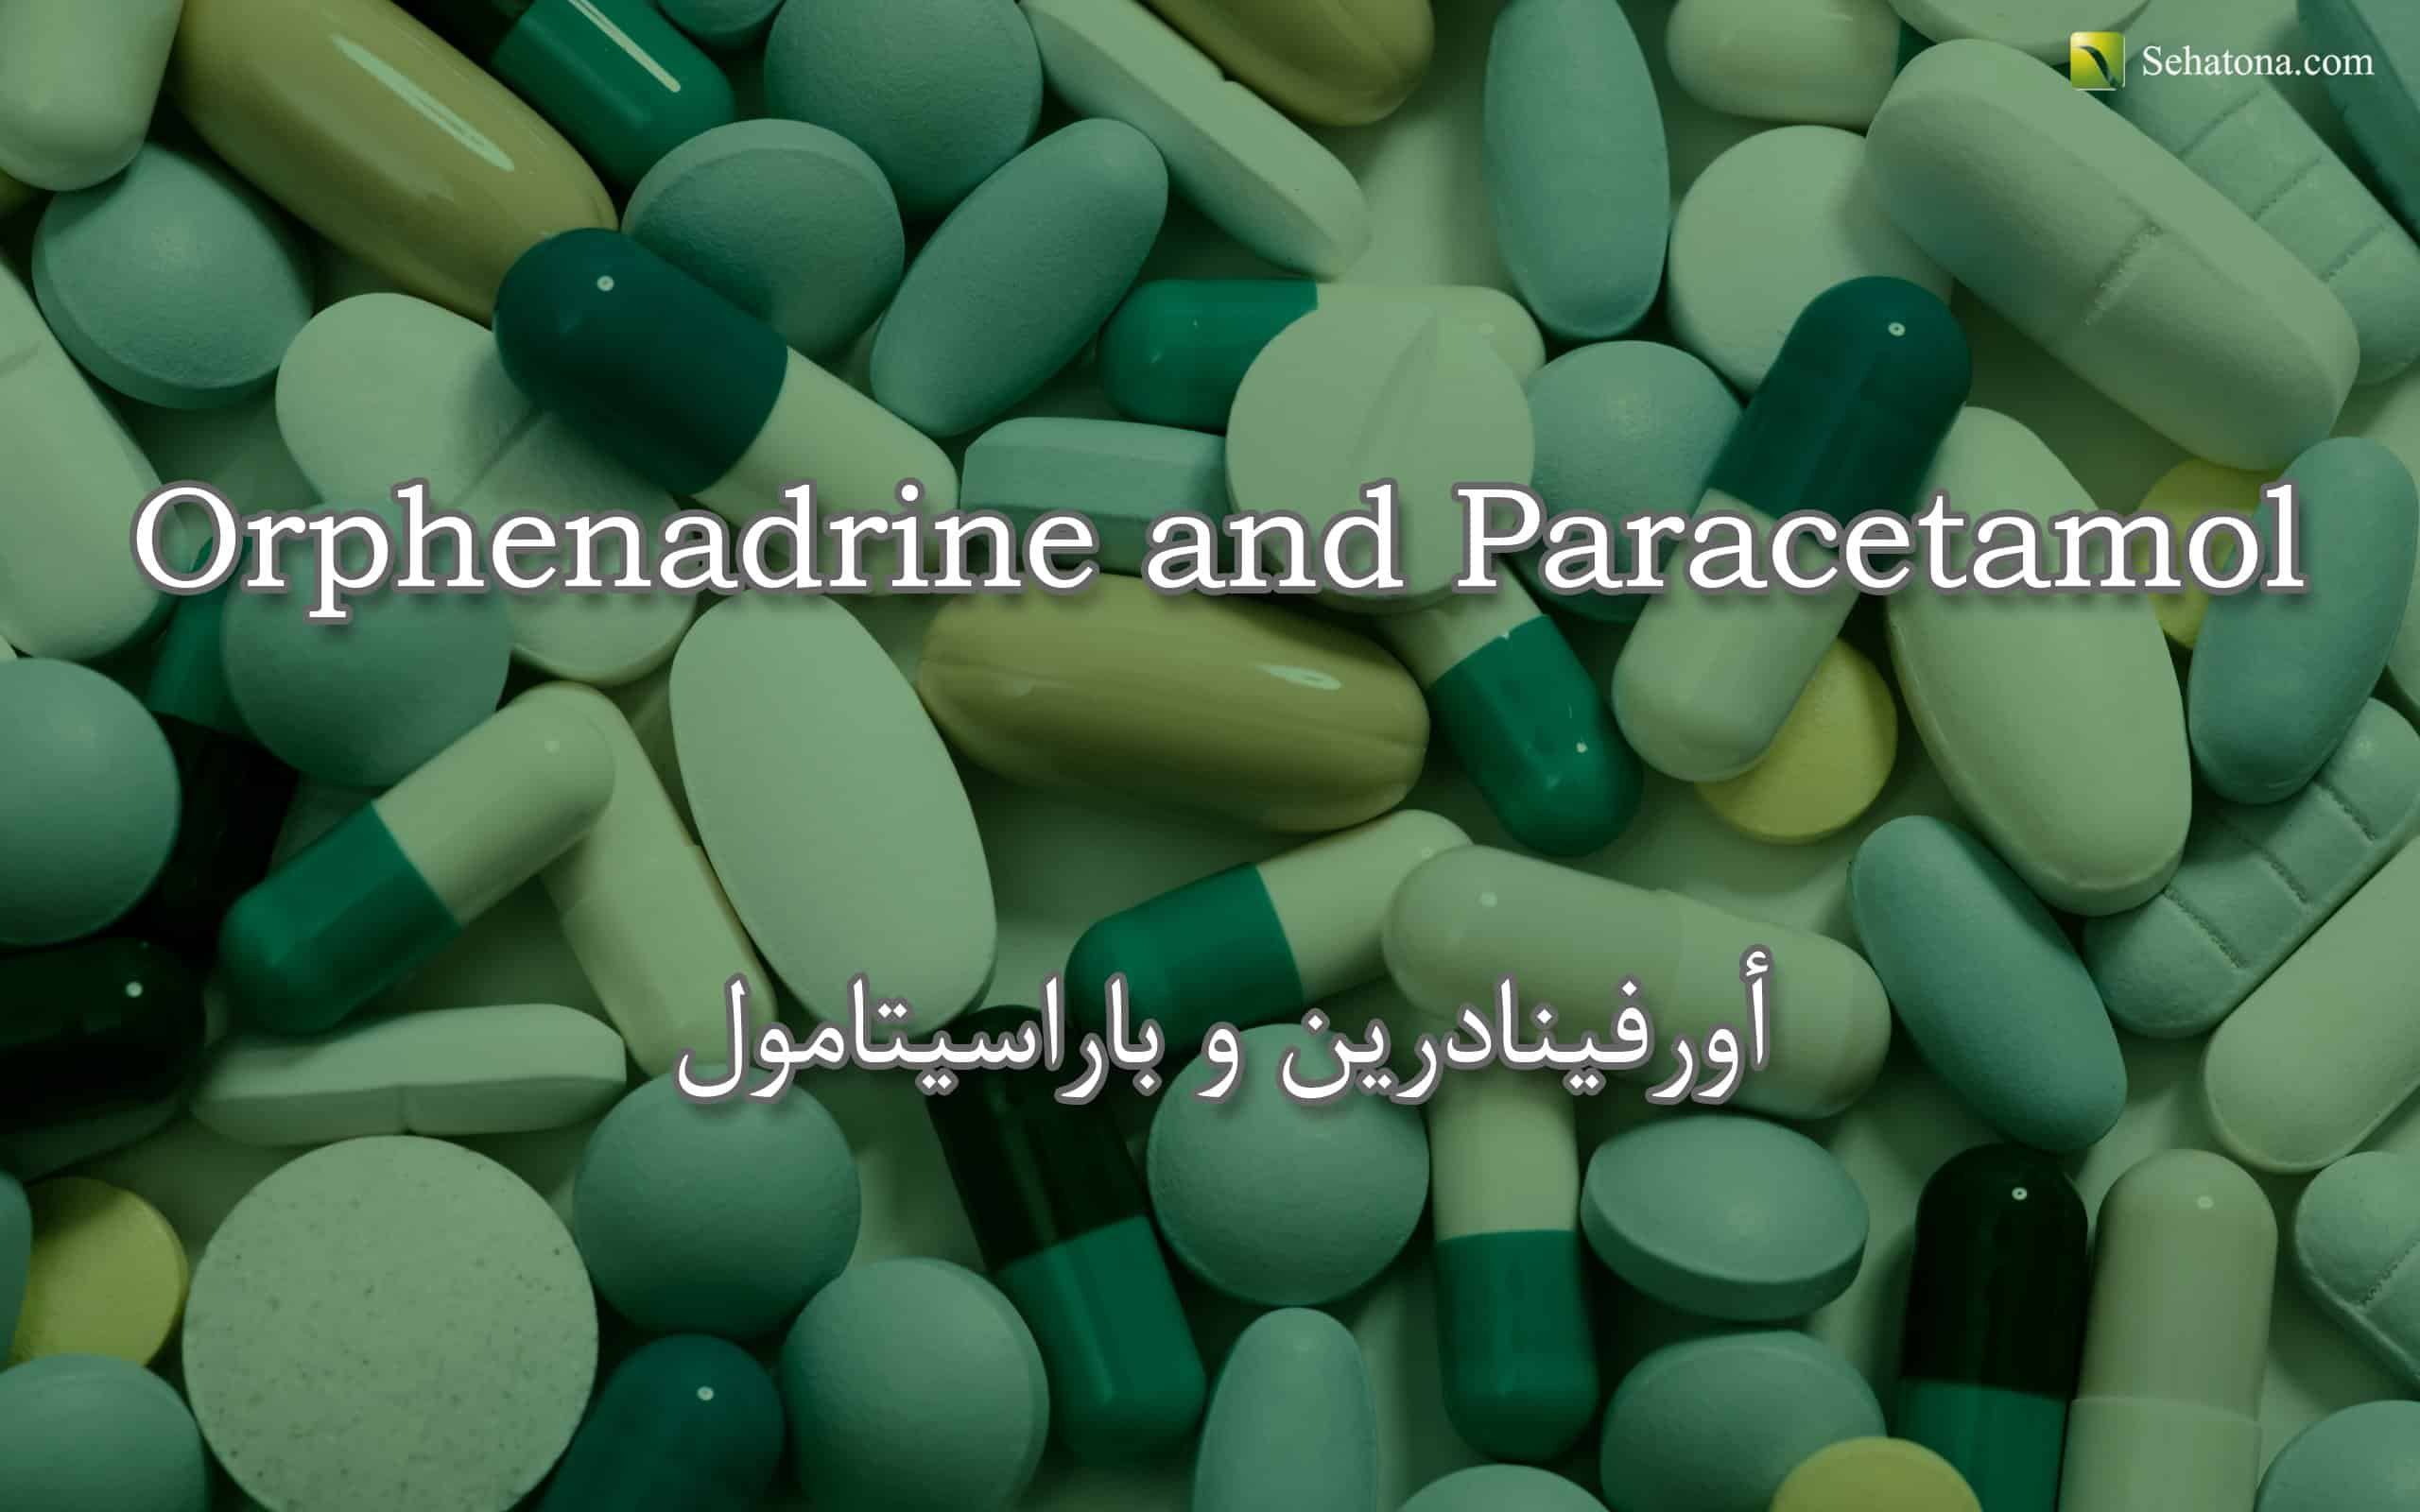 Orphenadrine and Paracetamol